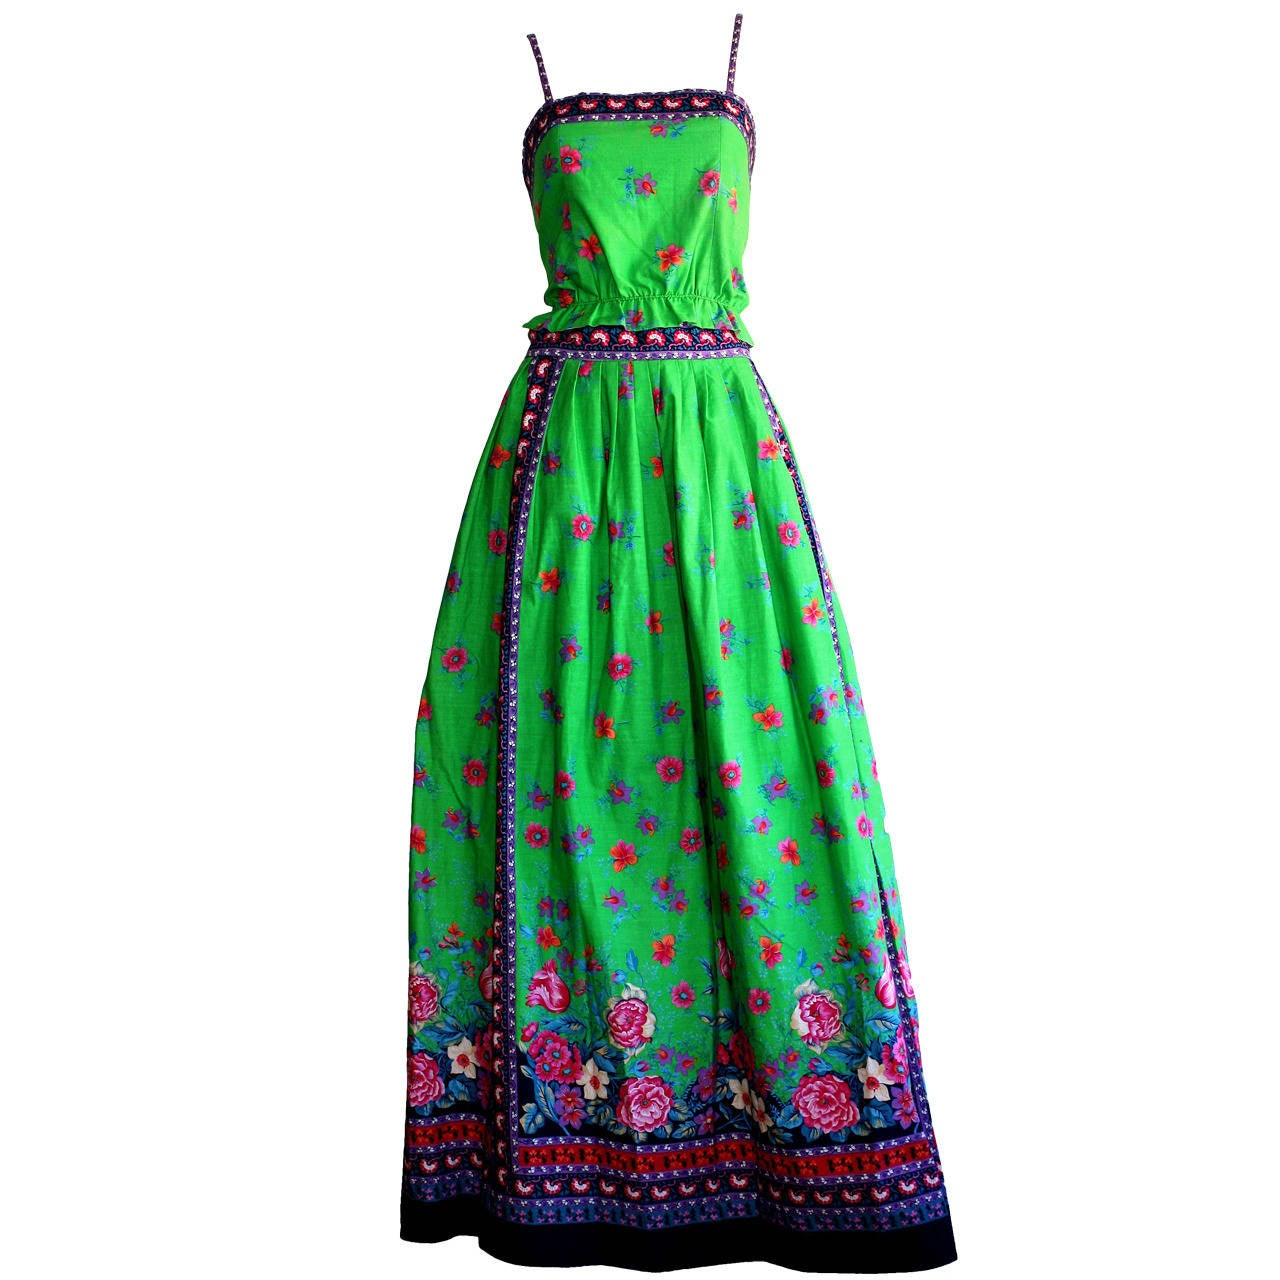 1960s Vintage Tina Leser Green Floral Print 2 - Piece Dress Ensemble For Sale